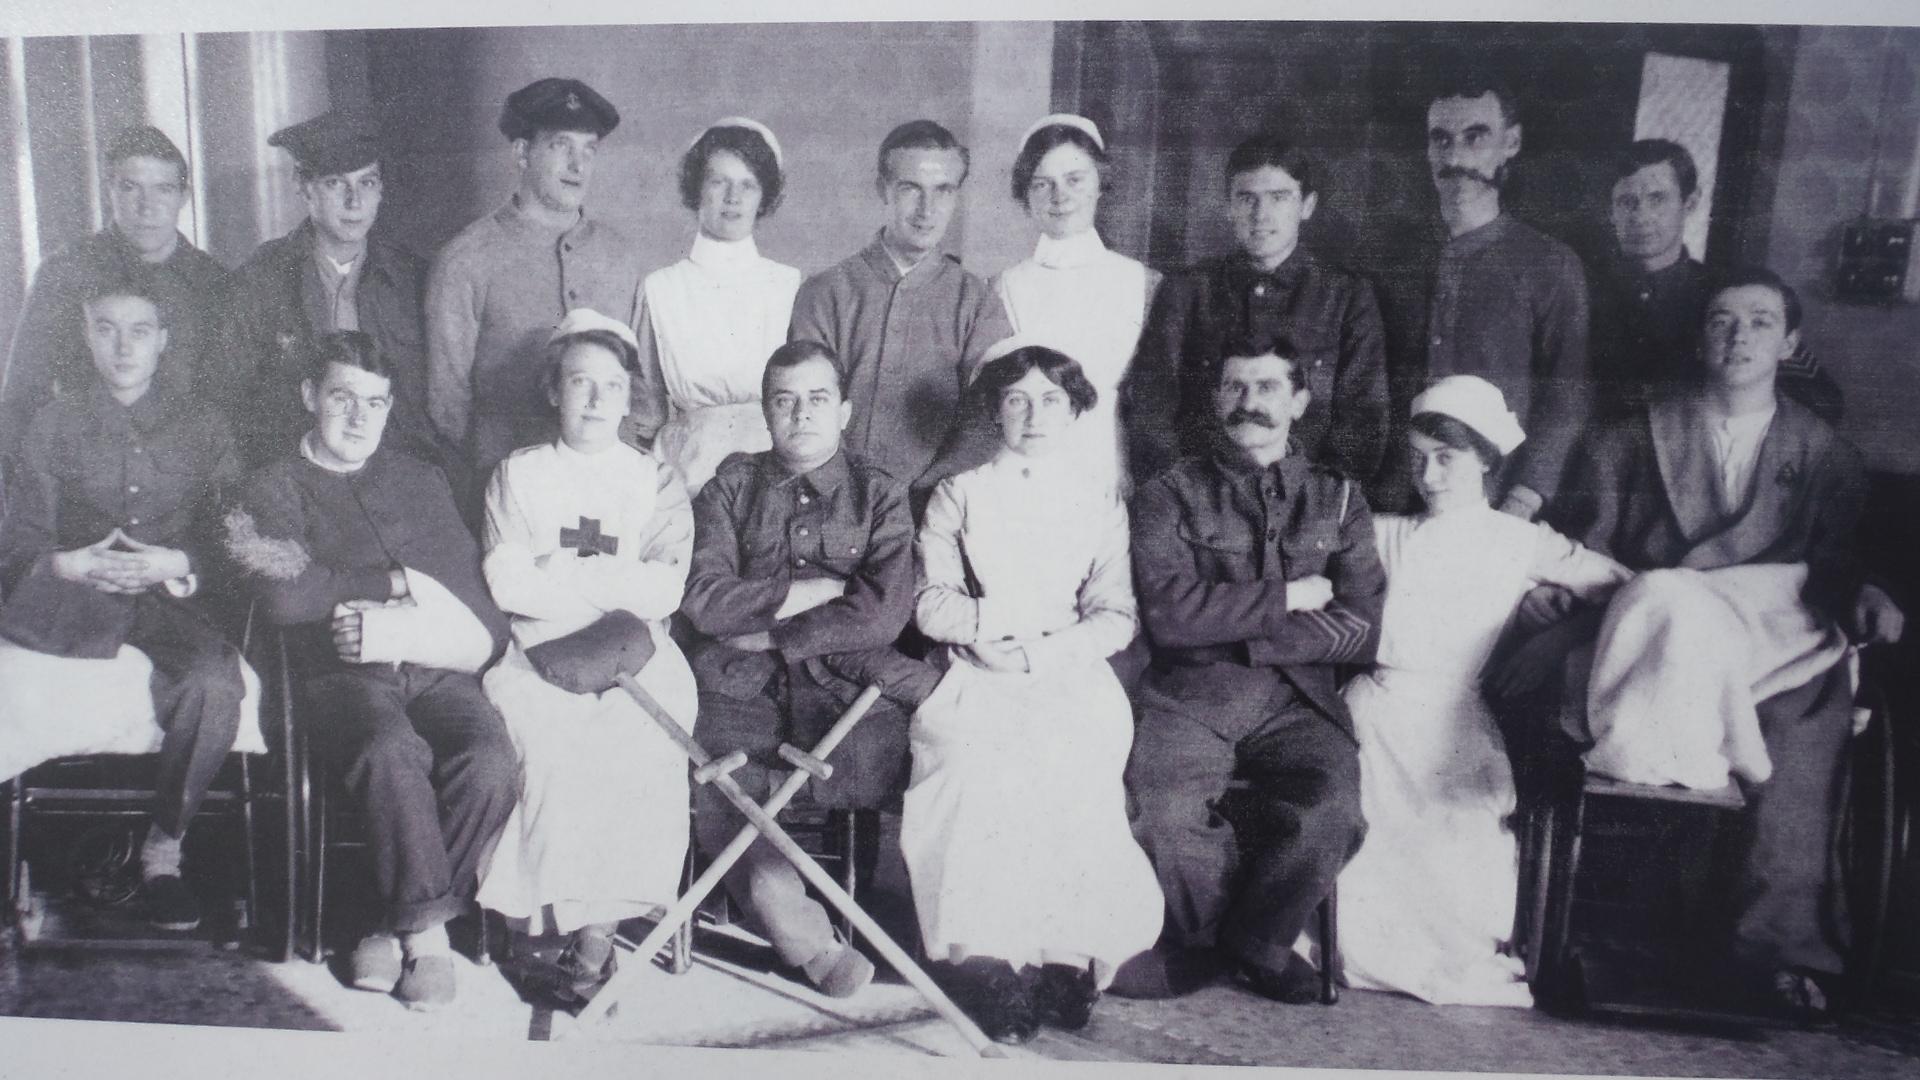 A Manchester hospital c1918